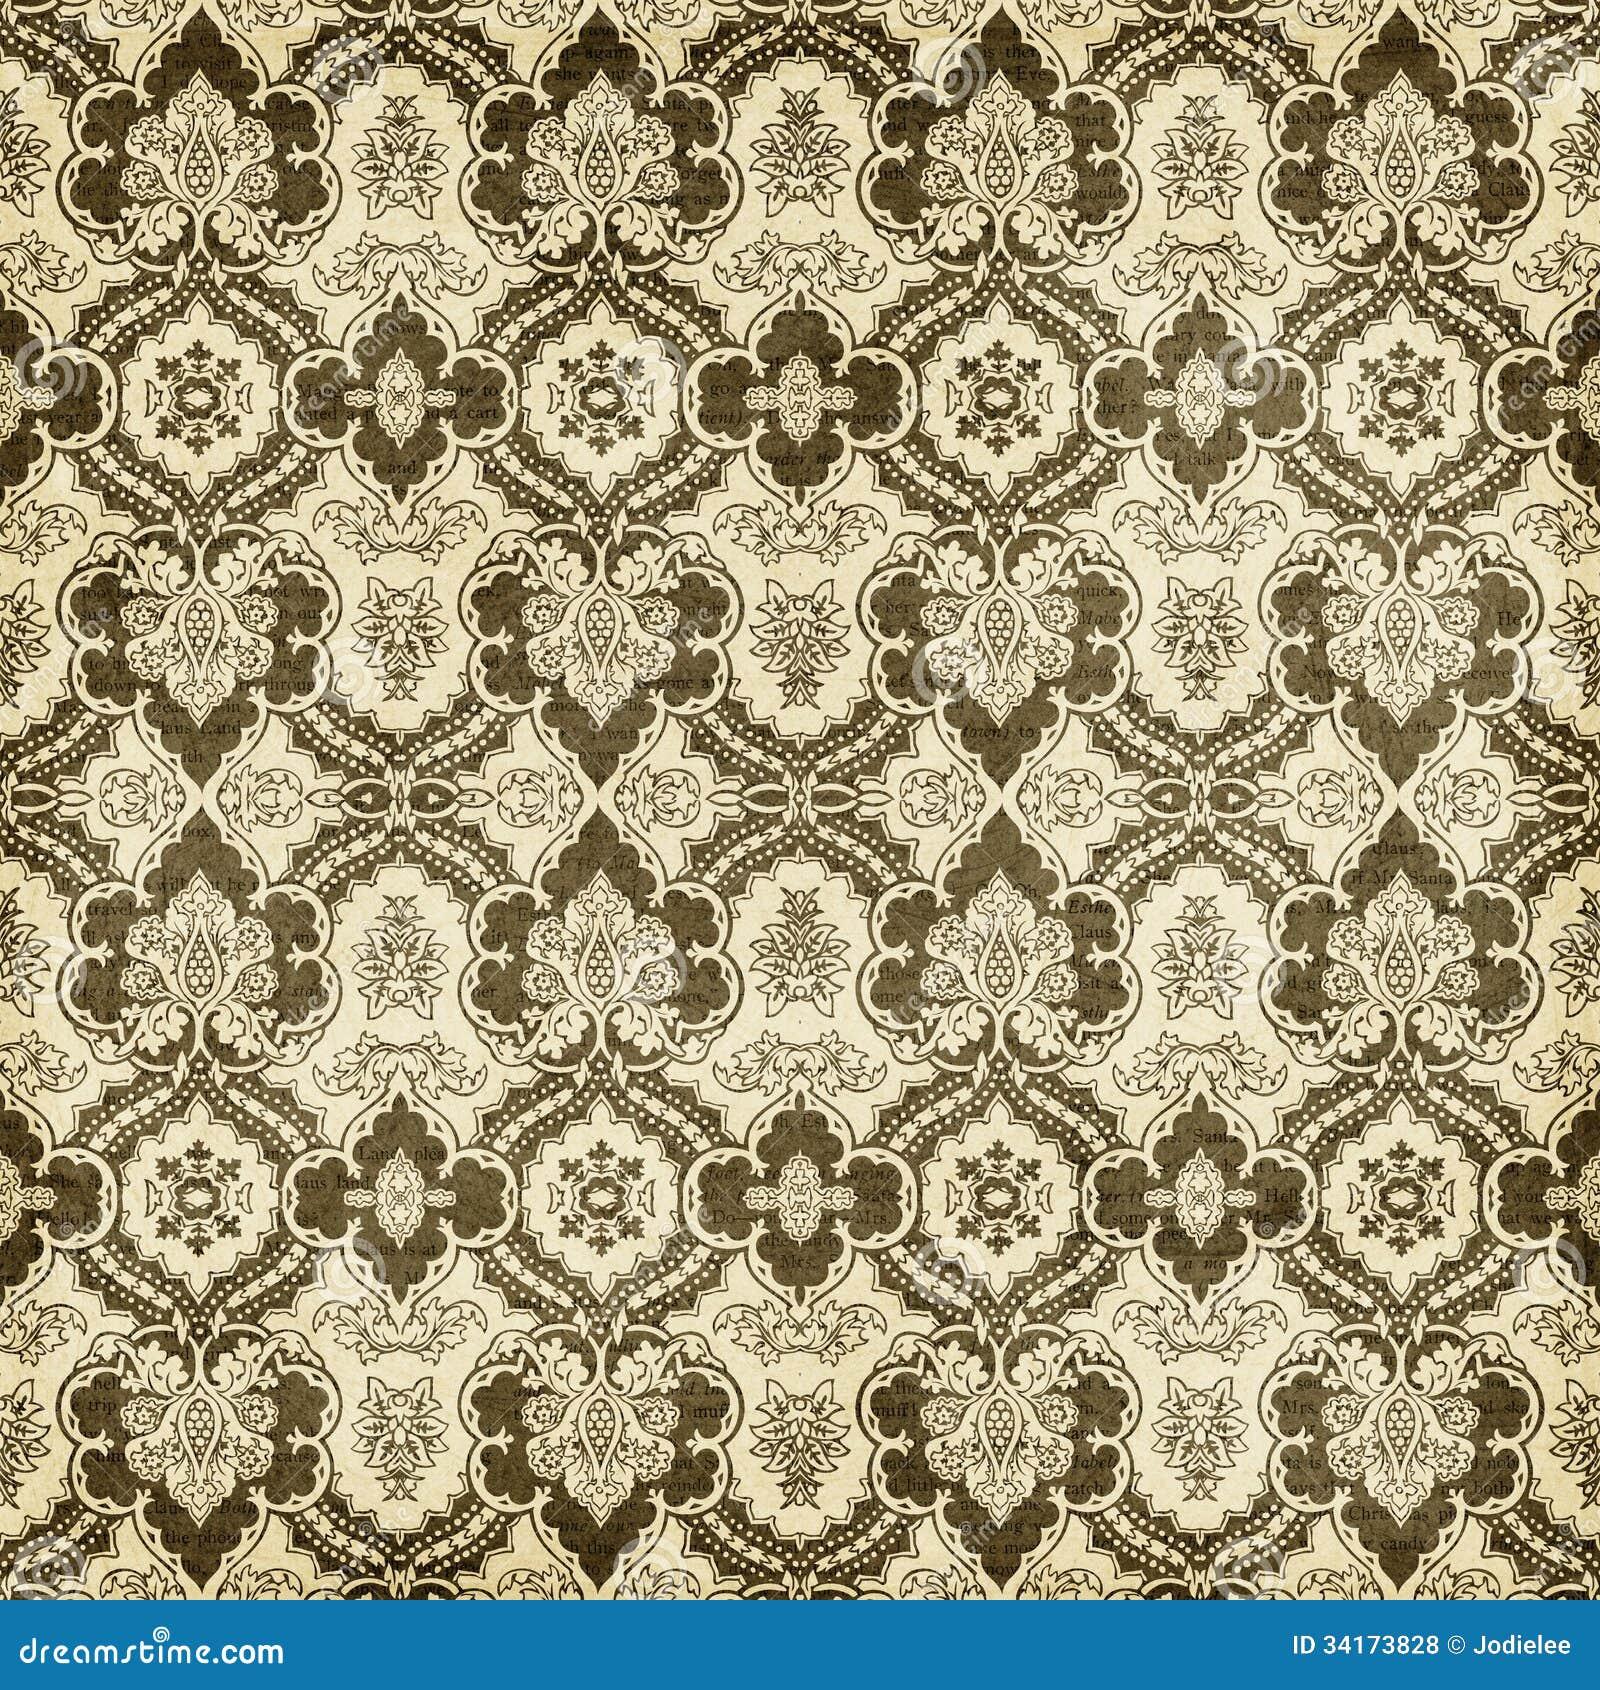 Antique vintage damask style pattern christmas wallpaper - Papel pintado vintage ...